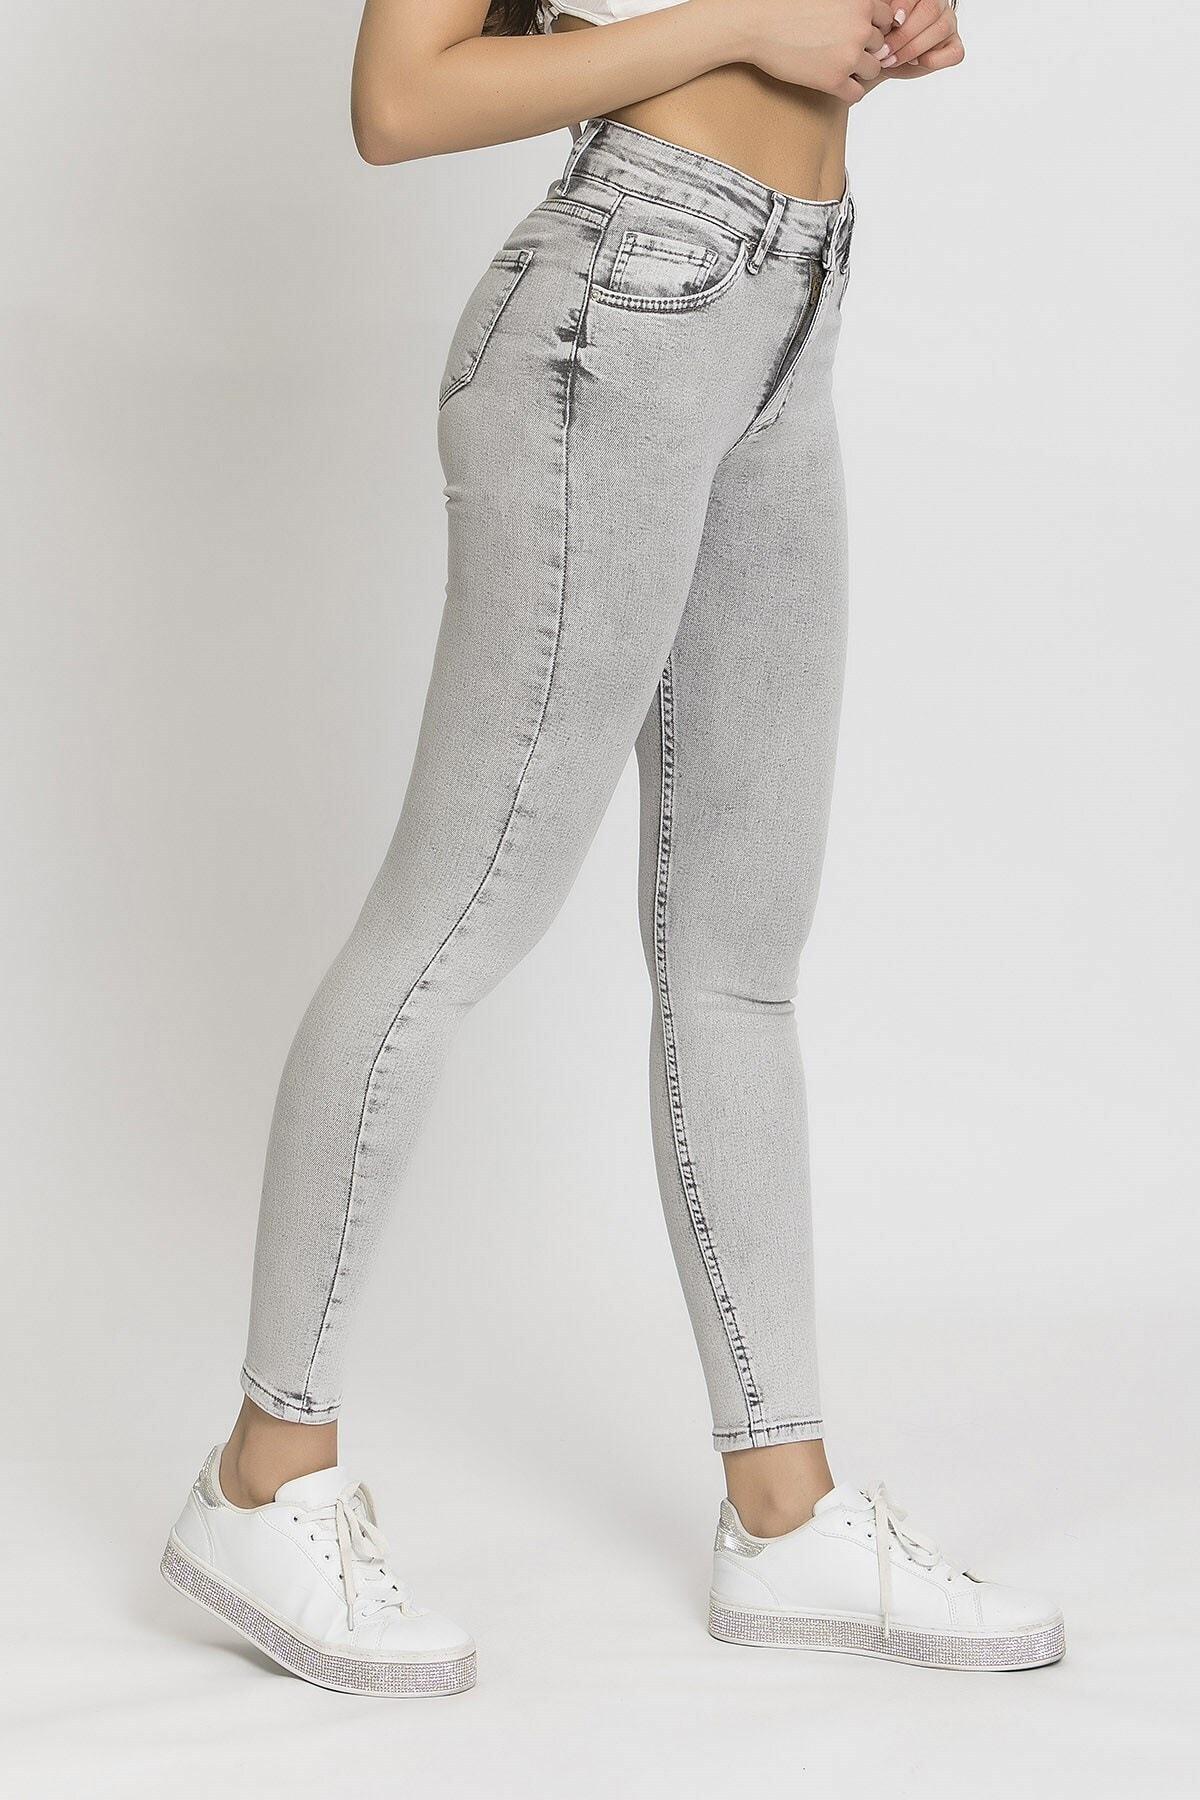 its basic Kadın Gri 5 Yüksek Bel Slim Fit Jean 2